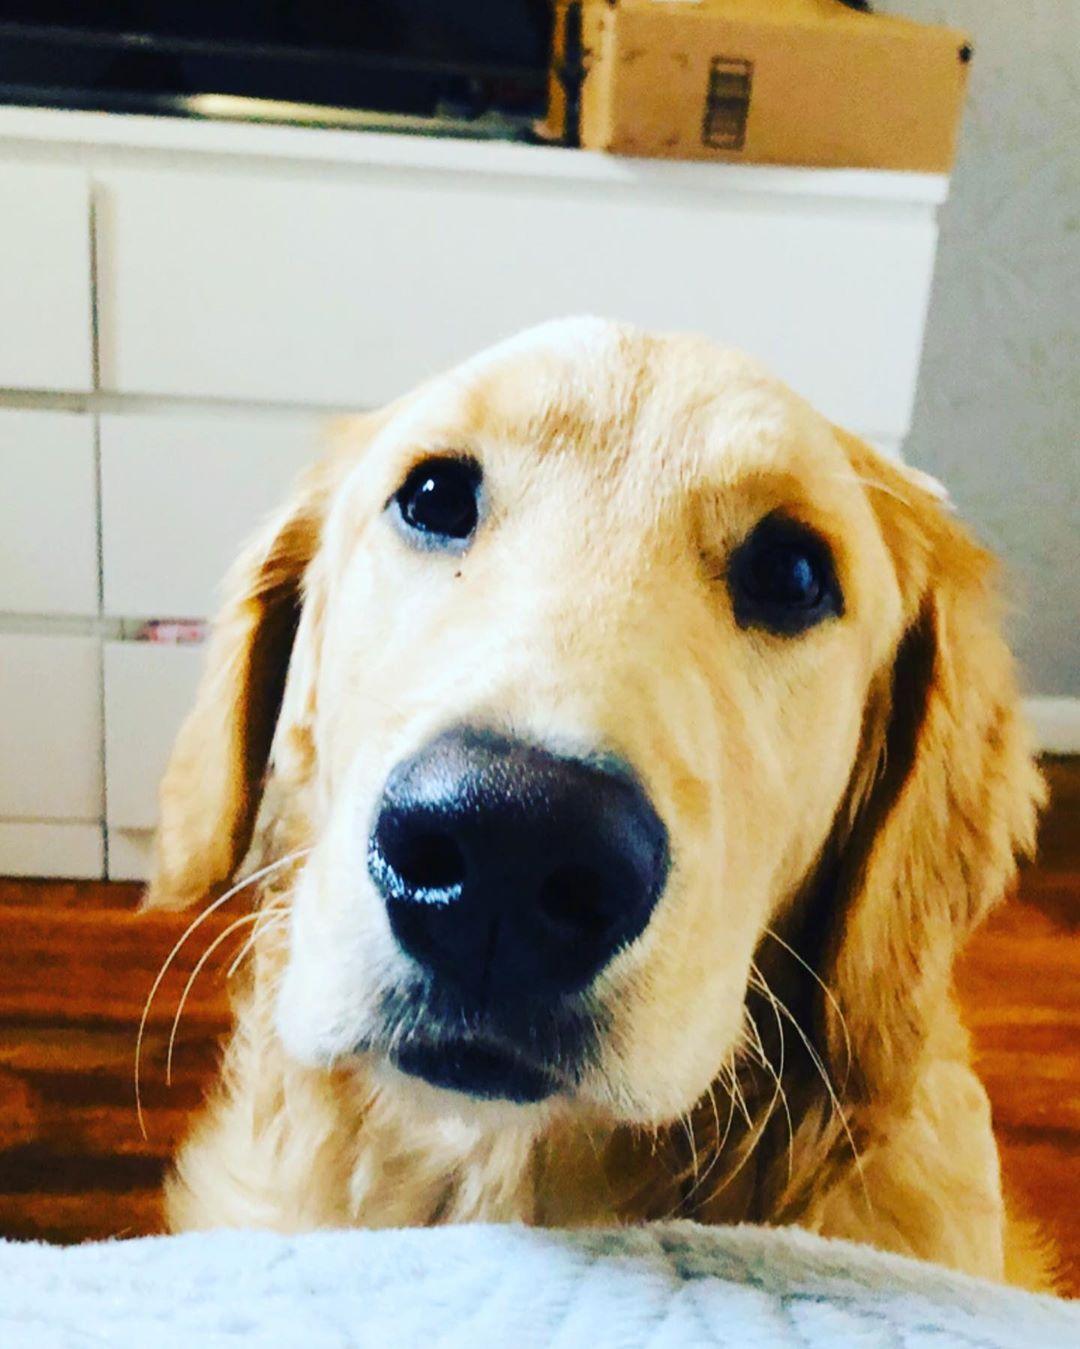 Puppy Goldenretriever Vincent Eldiariodevincent 614 Columbus Pet Doggy Doggo Petlovers Happiness Instagram Pets Puppies Funny Animals